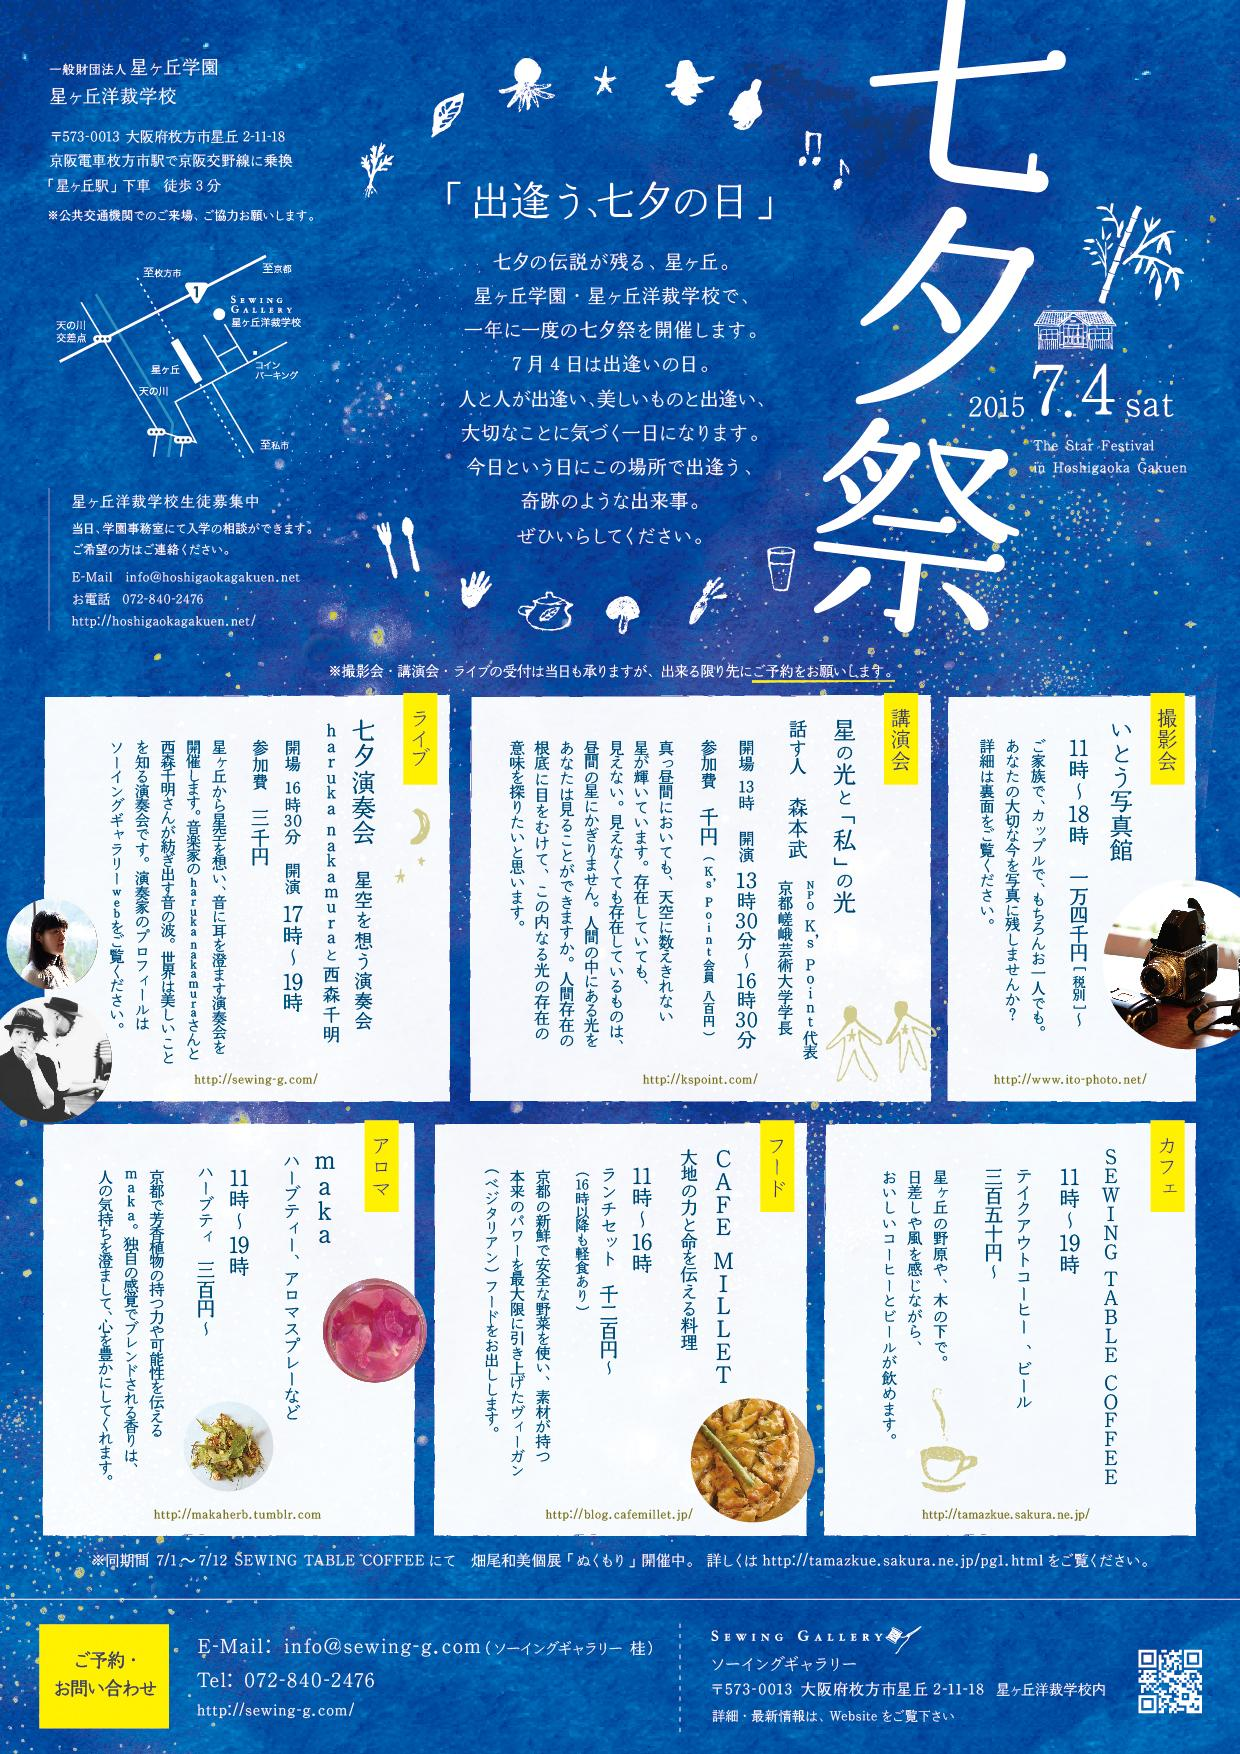 tanabata_hoshigaoka2015表くっつけ